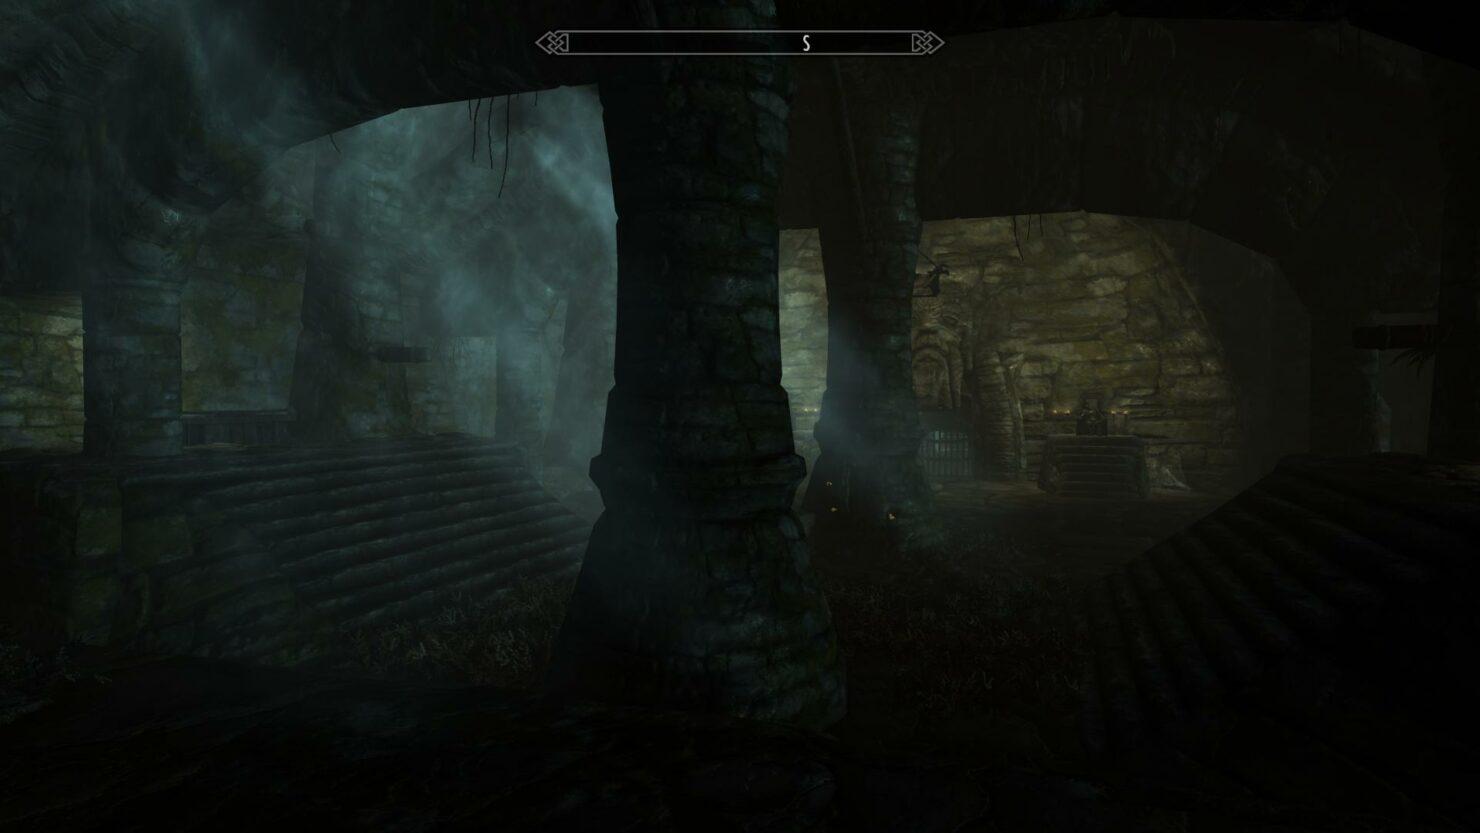 witcher-3-inspired-skyrim-fan-expansion-land-of-vominheim-8